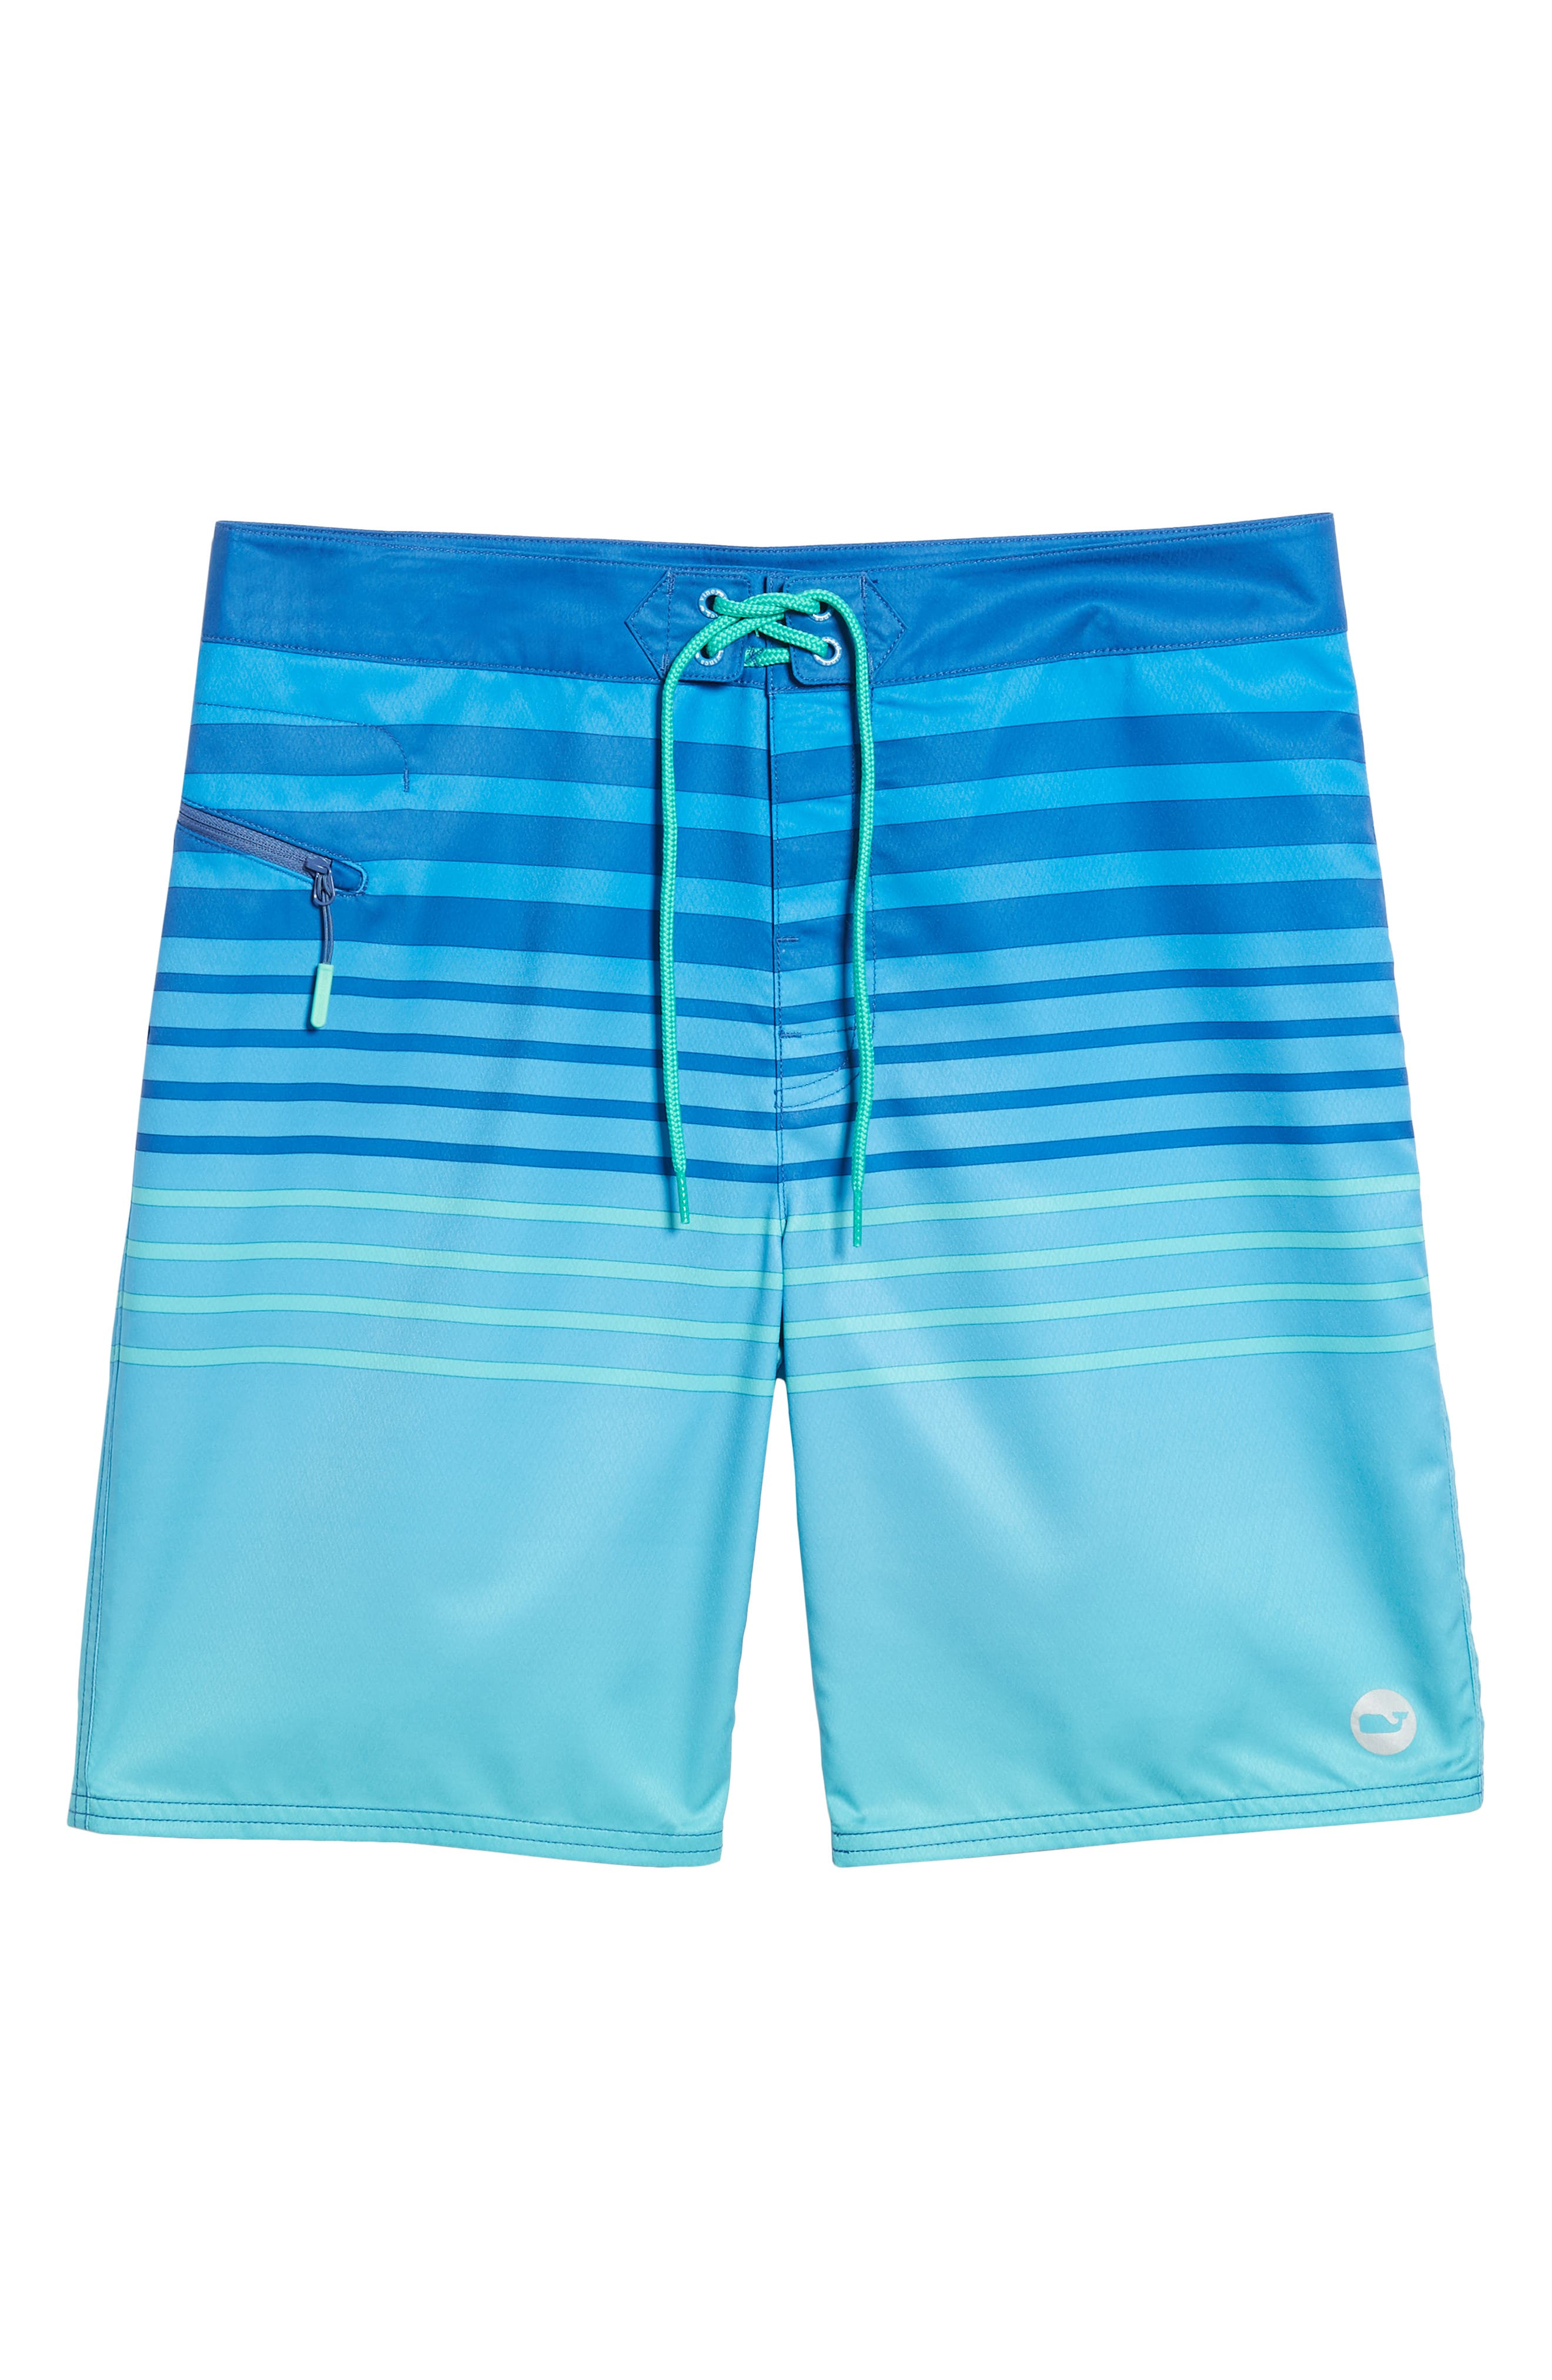 Surflodge Stripe Board Shorts,                             Alternate thumbnail 6, color,                             359